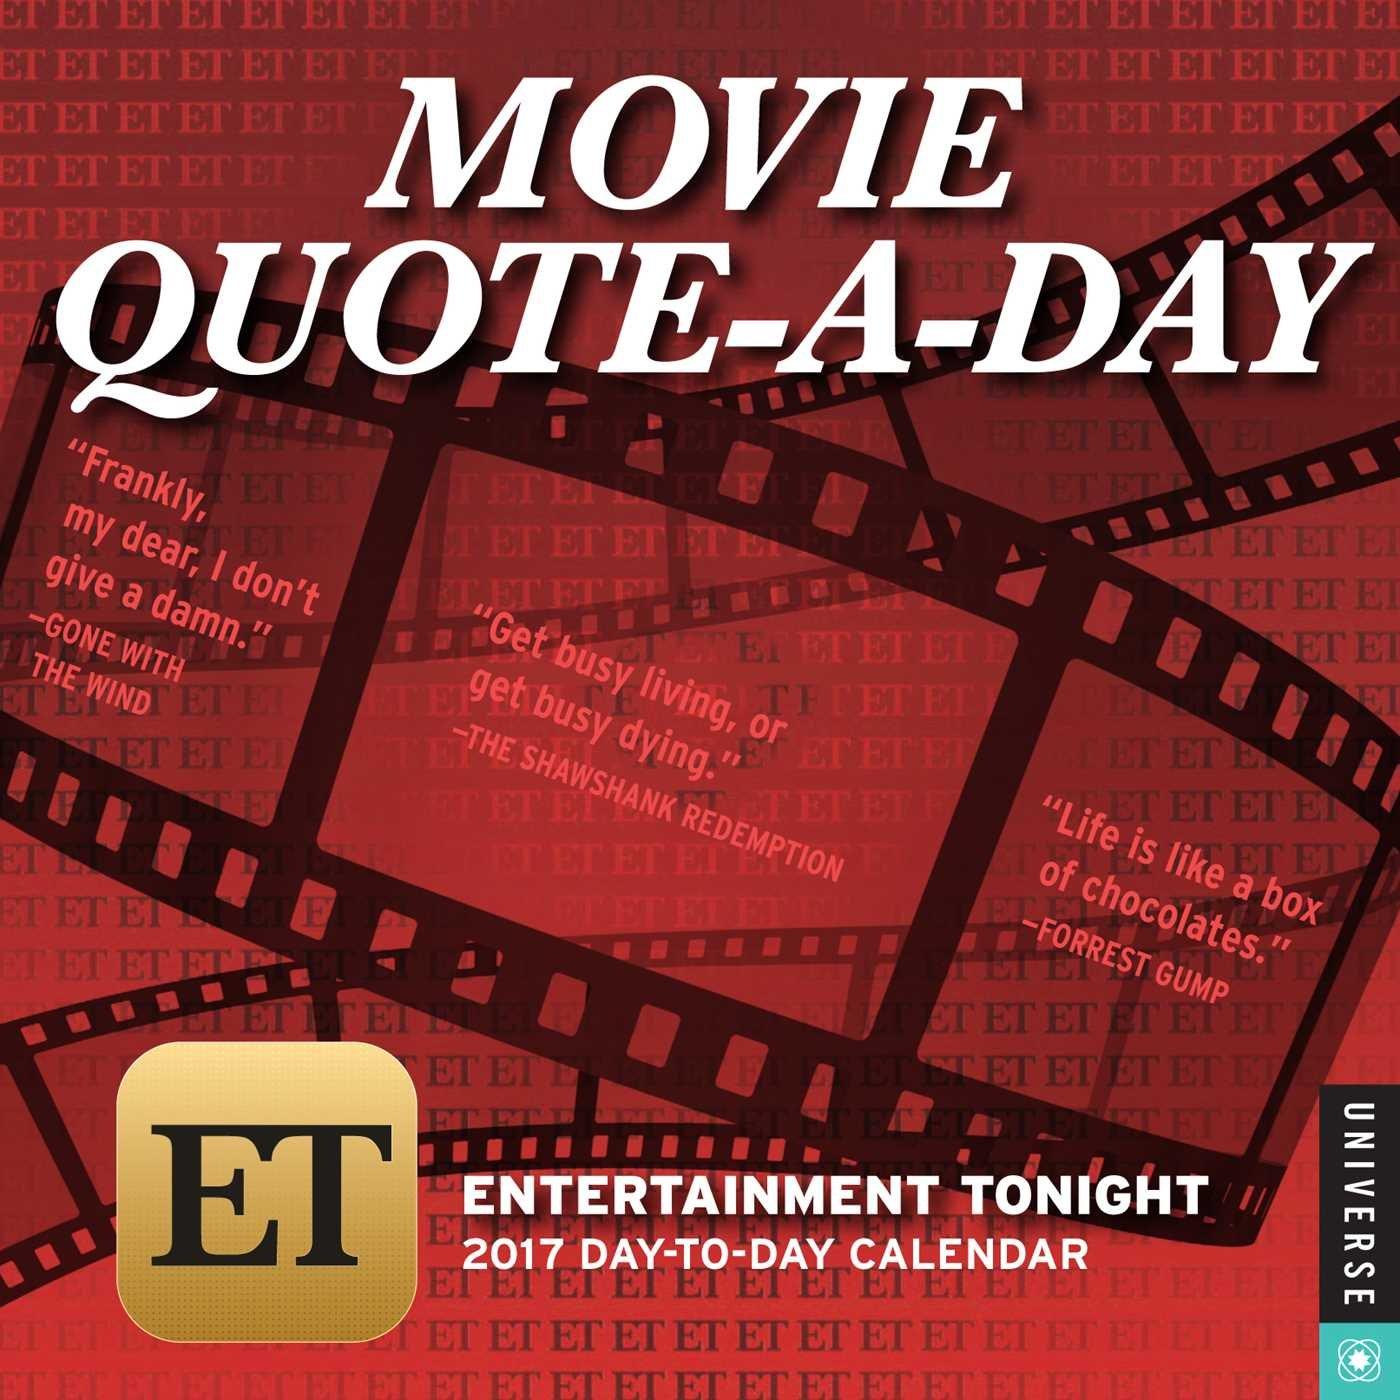 Entertainment Tonight Movie Quote Calendar Product Image